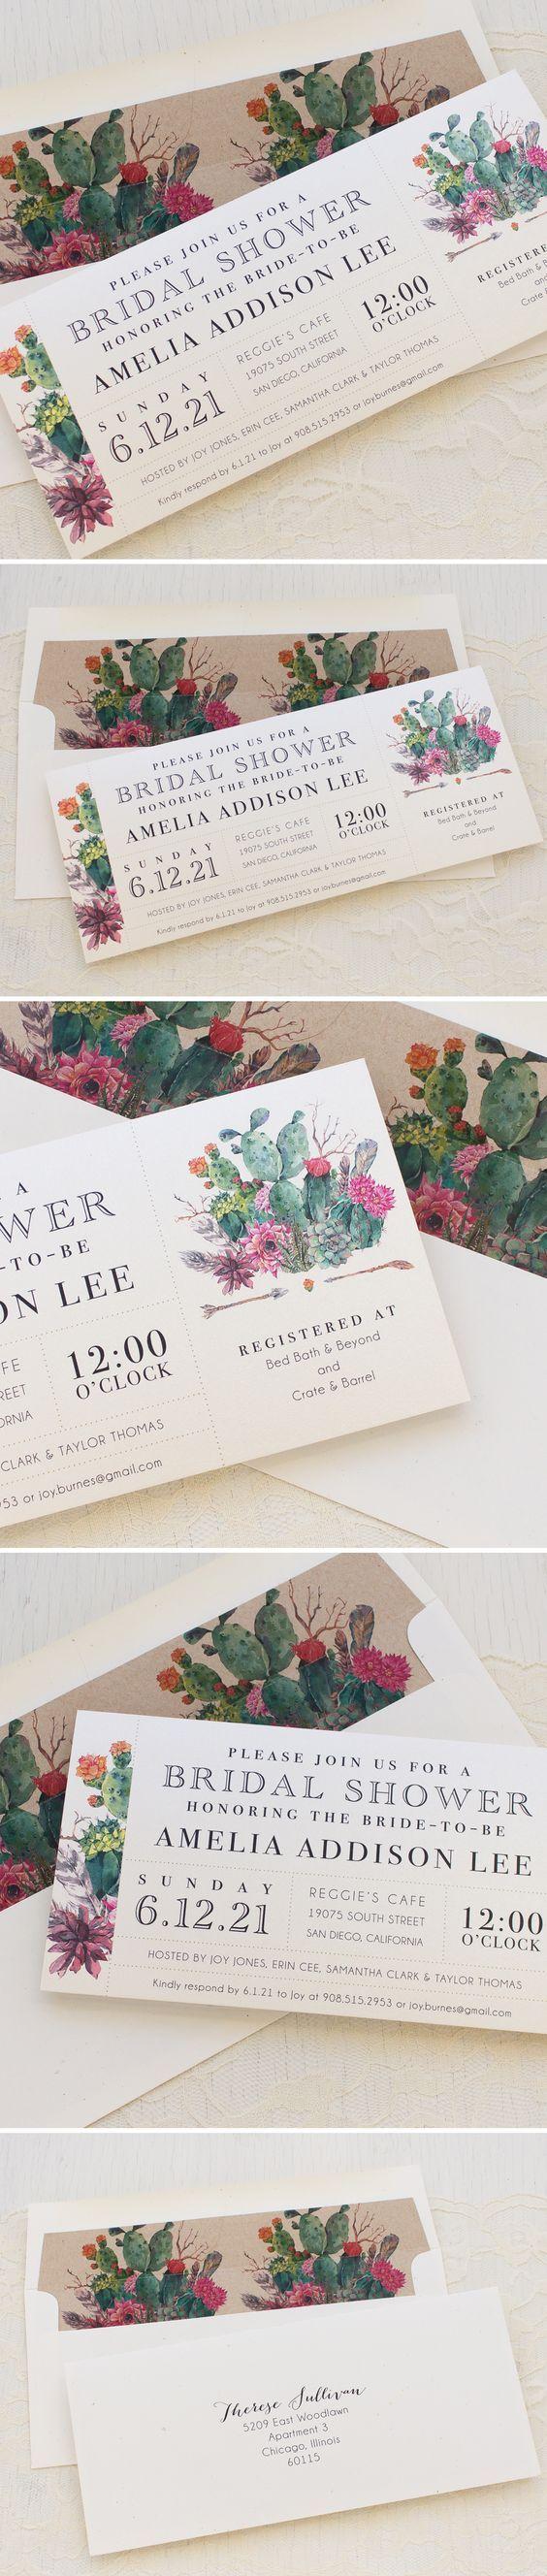 Desert Blooms Bridal Shower Invitations 5165 best